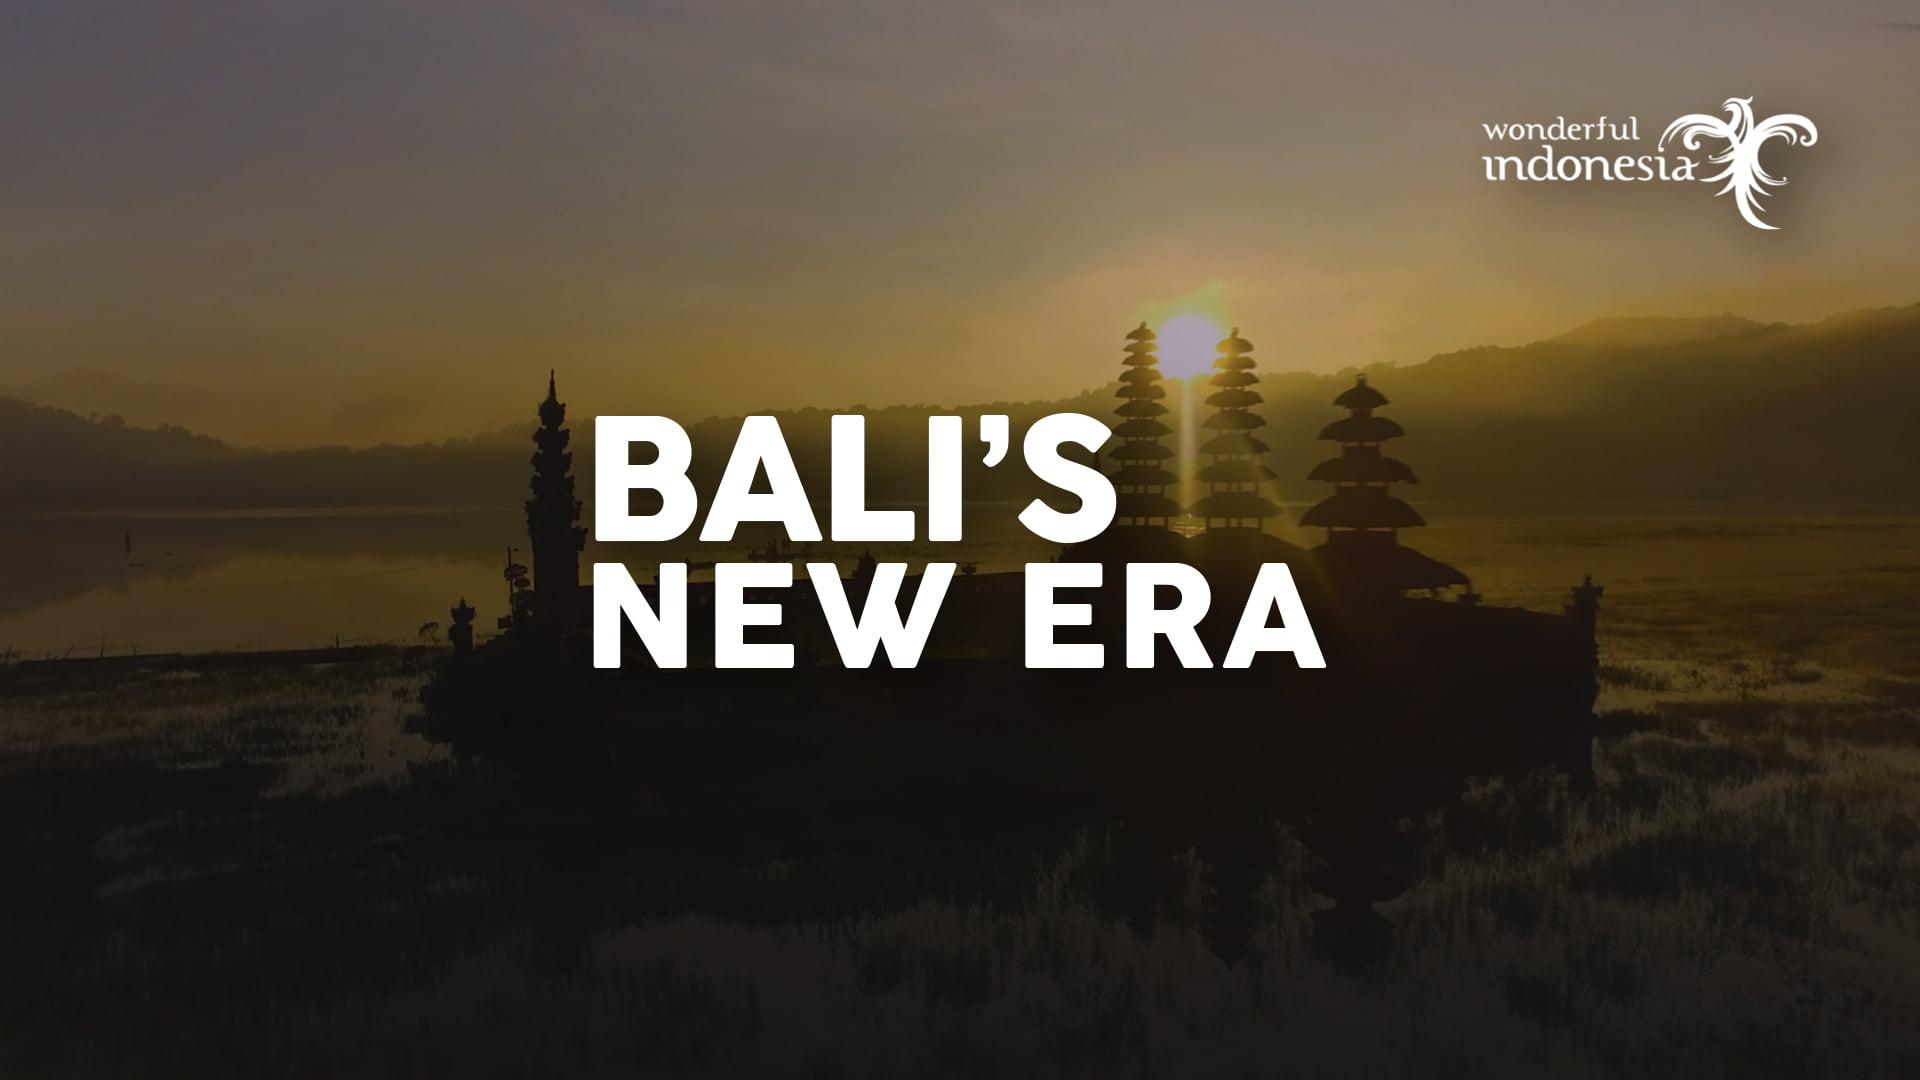 Welcome to Bali's New Era